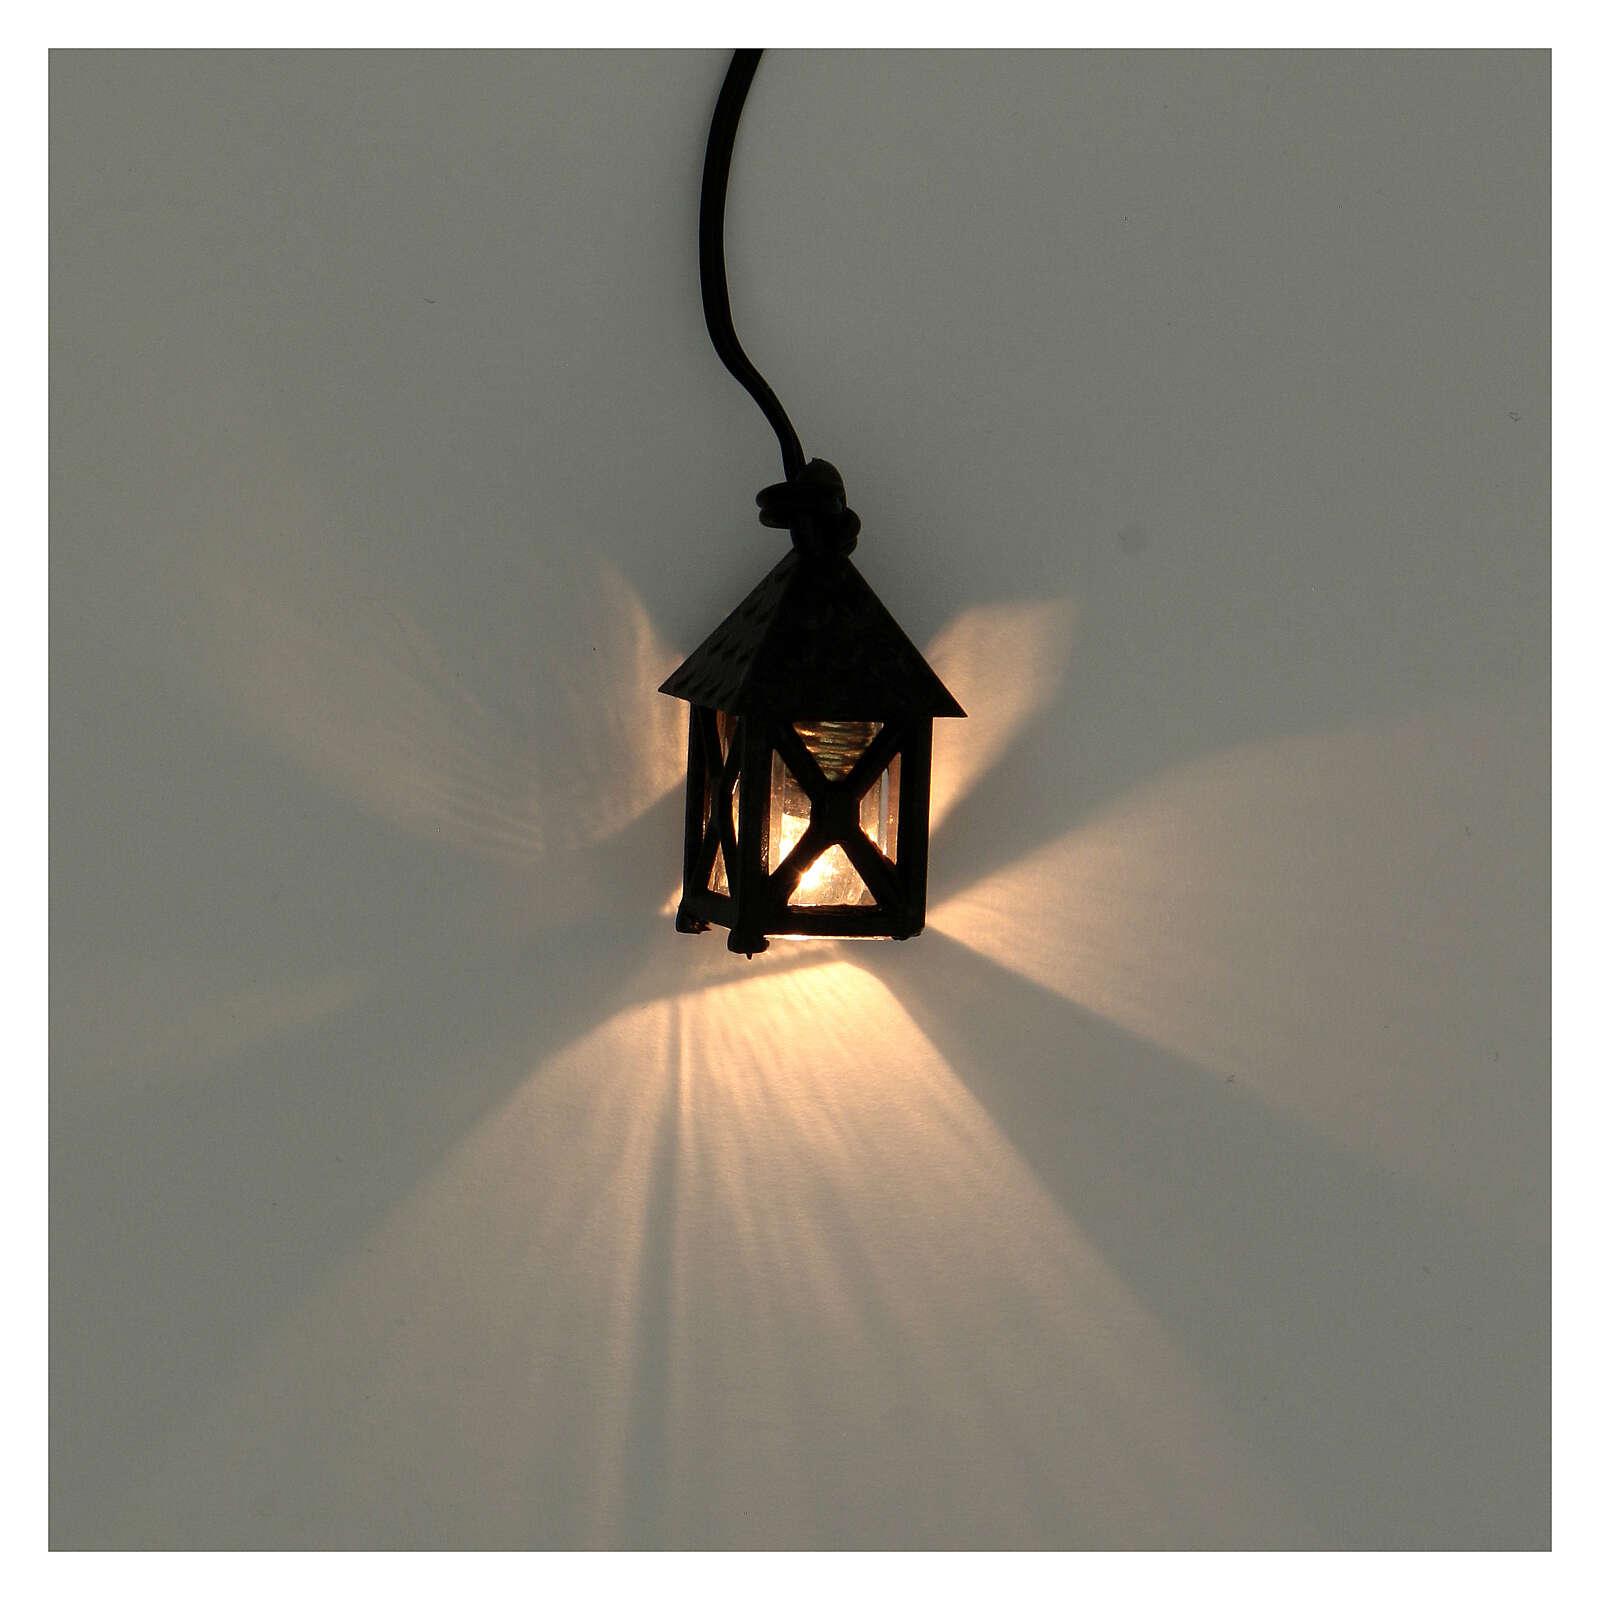 Lanterna presepe fai da te 8 cm luce bianca h 2,5 cm 4